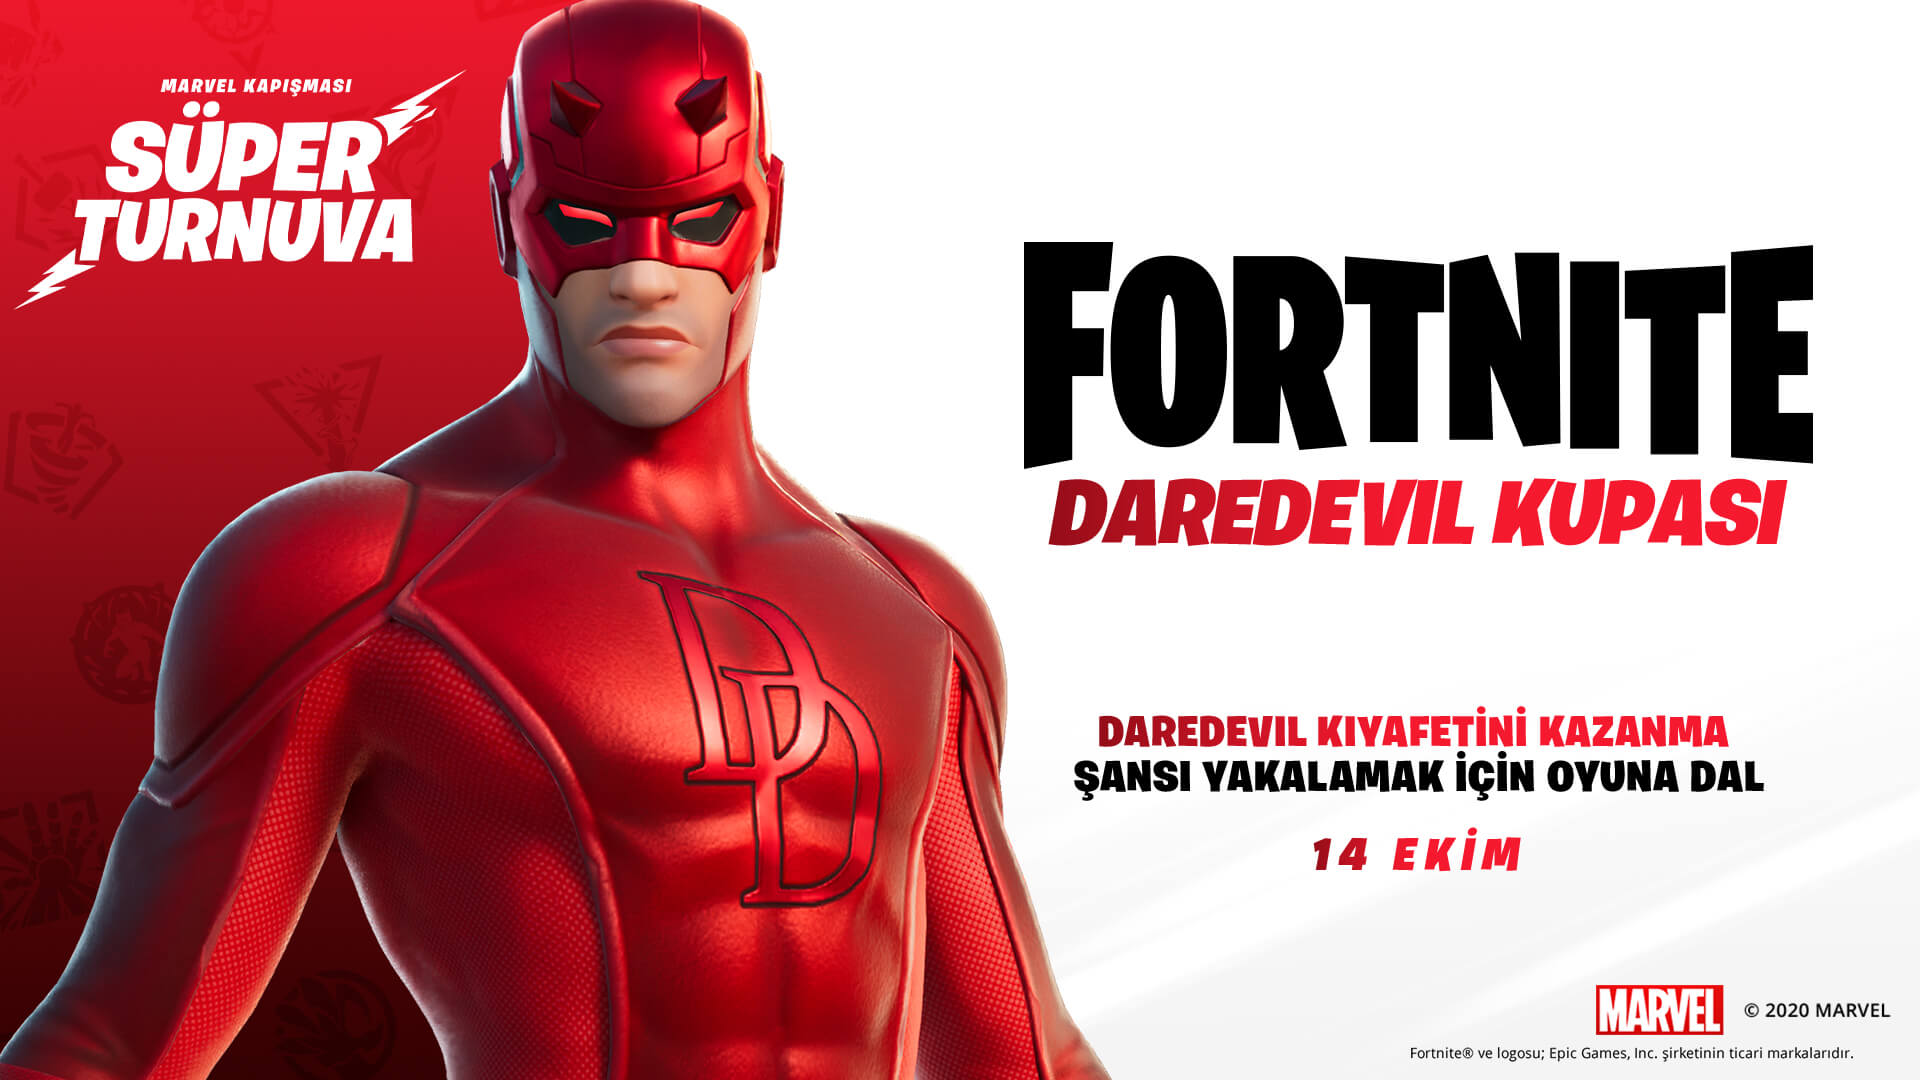 TR 14BR Competitive MarvelSuperSeries DaredevilCup Social